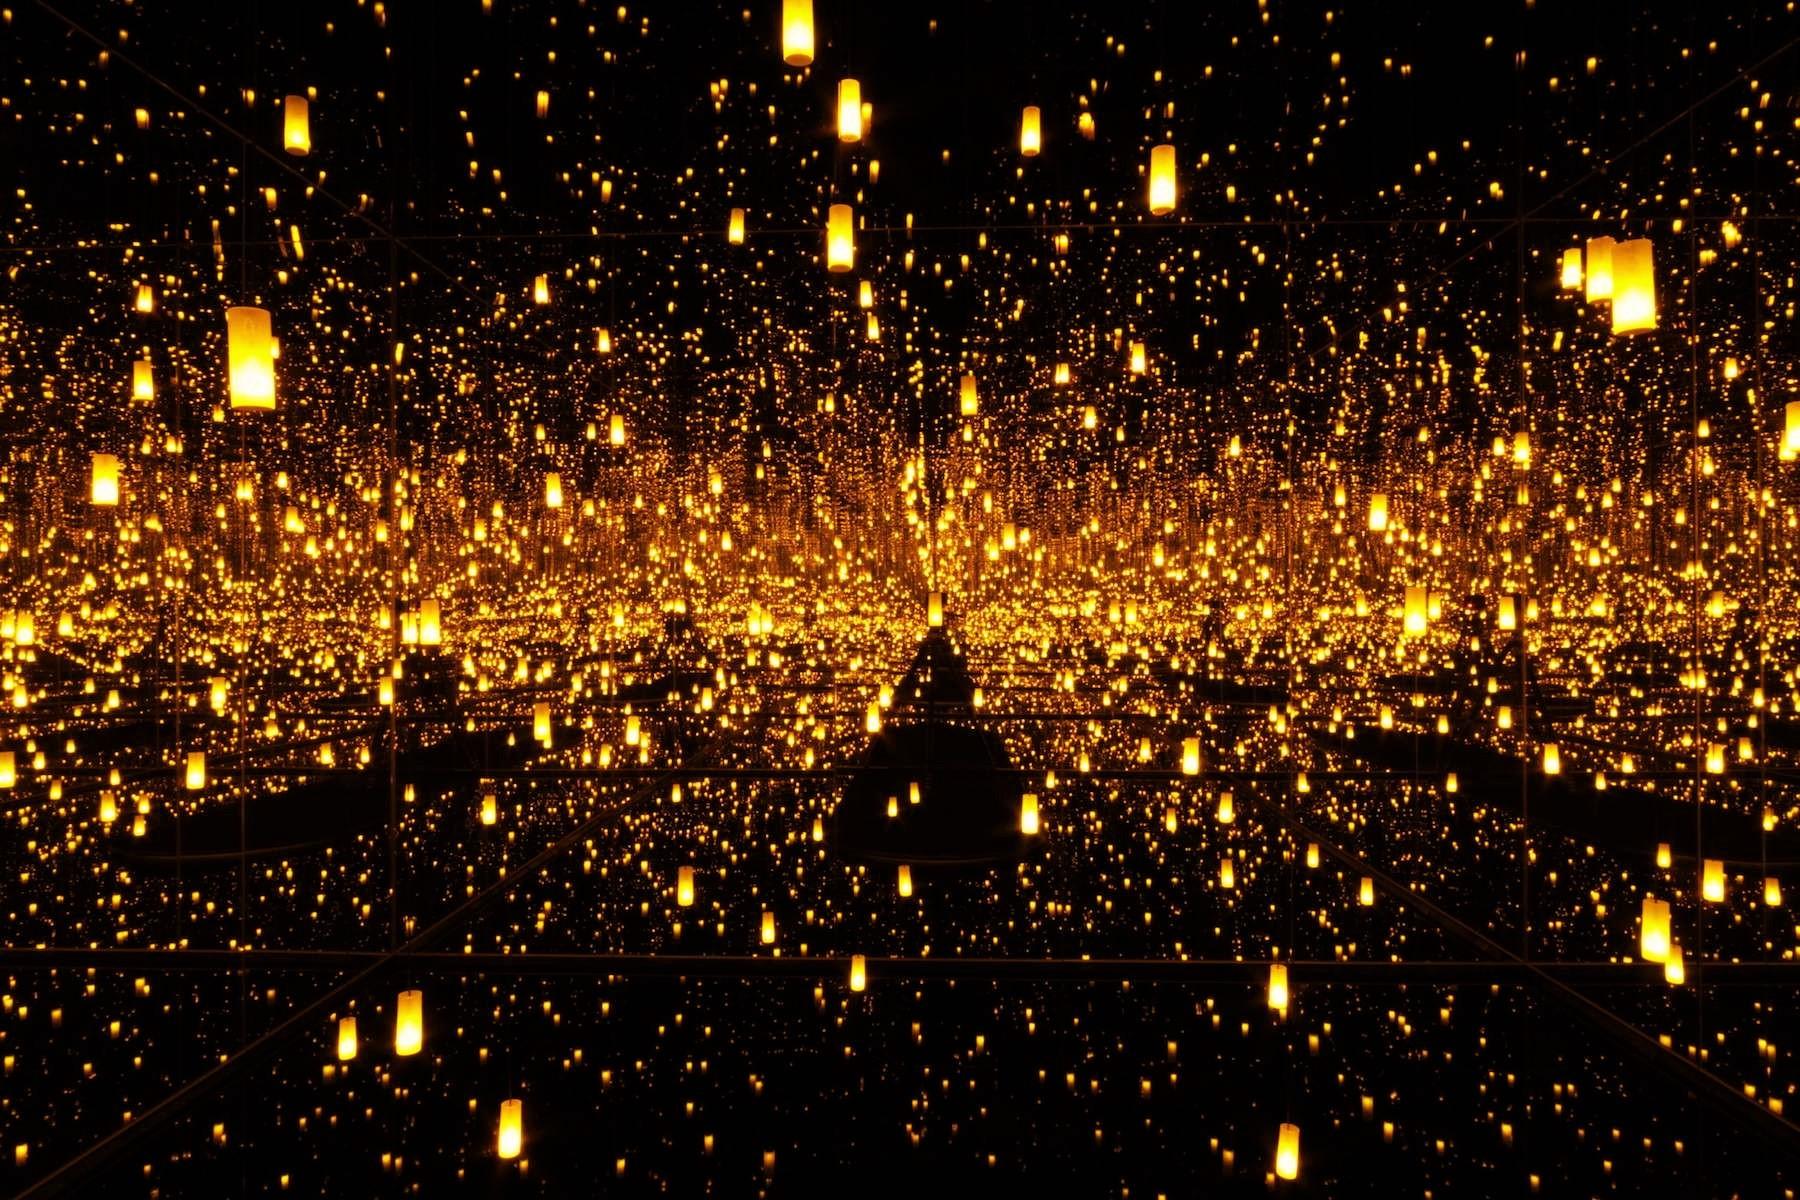 Yayoi Kusama Aftermath of Obliteration of Eternity (2009). ©Yayoi Kusama